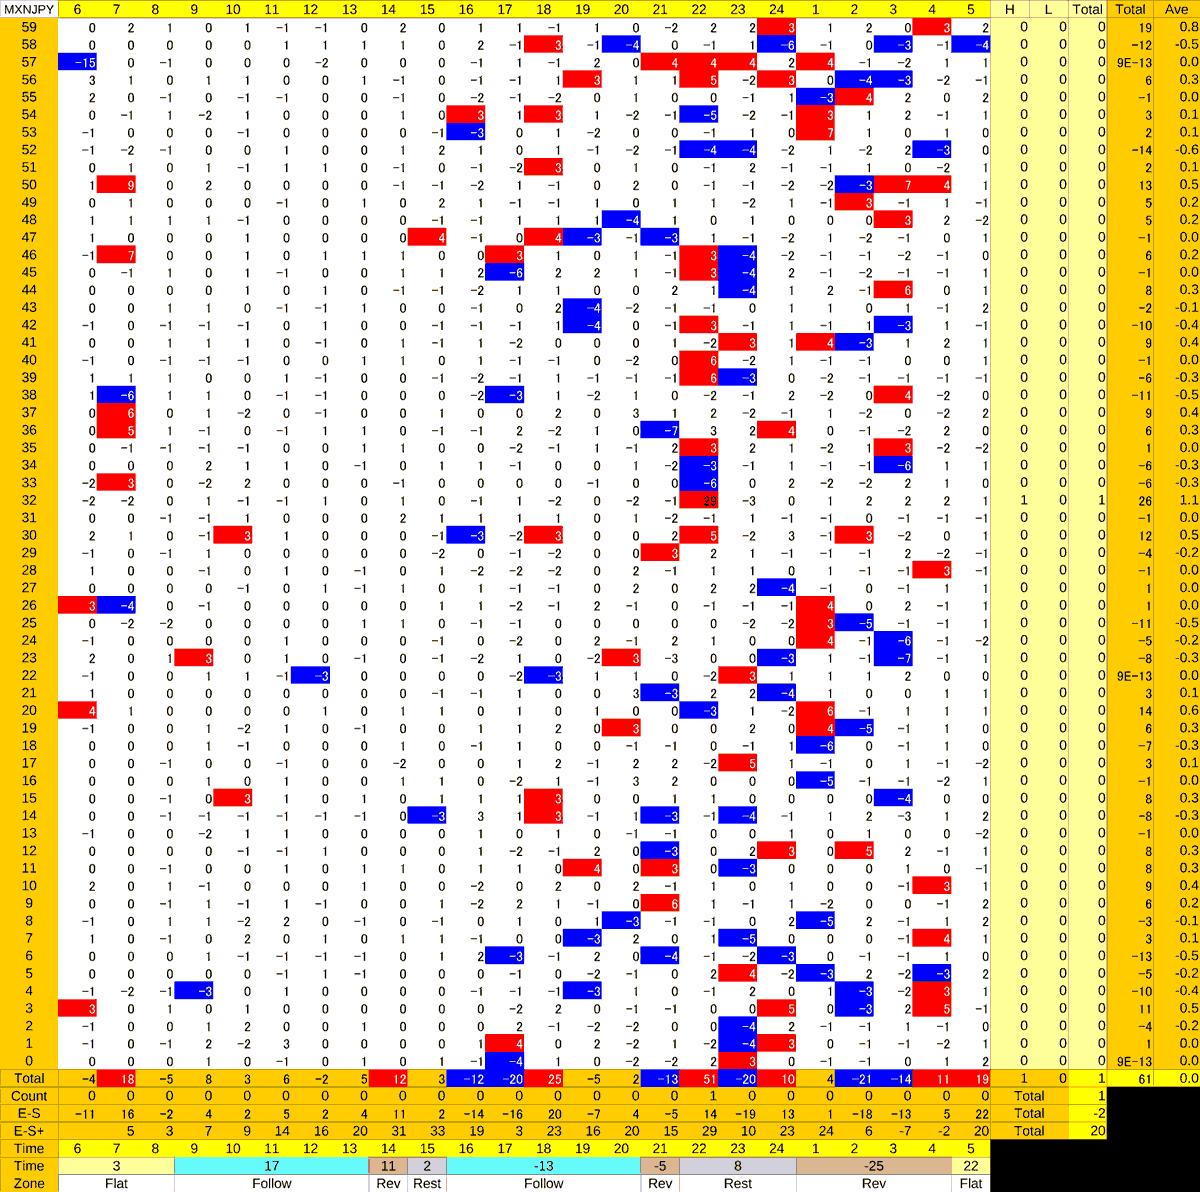 20210108_HS(3)MXNJPY